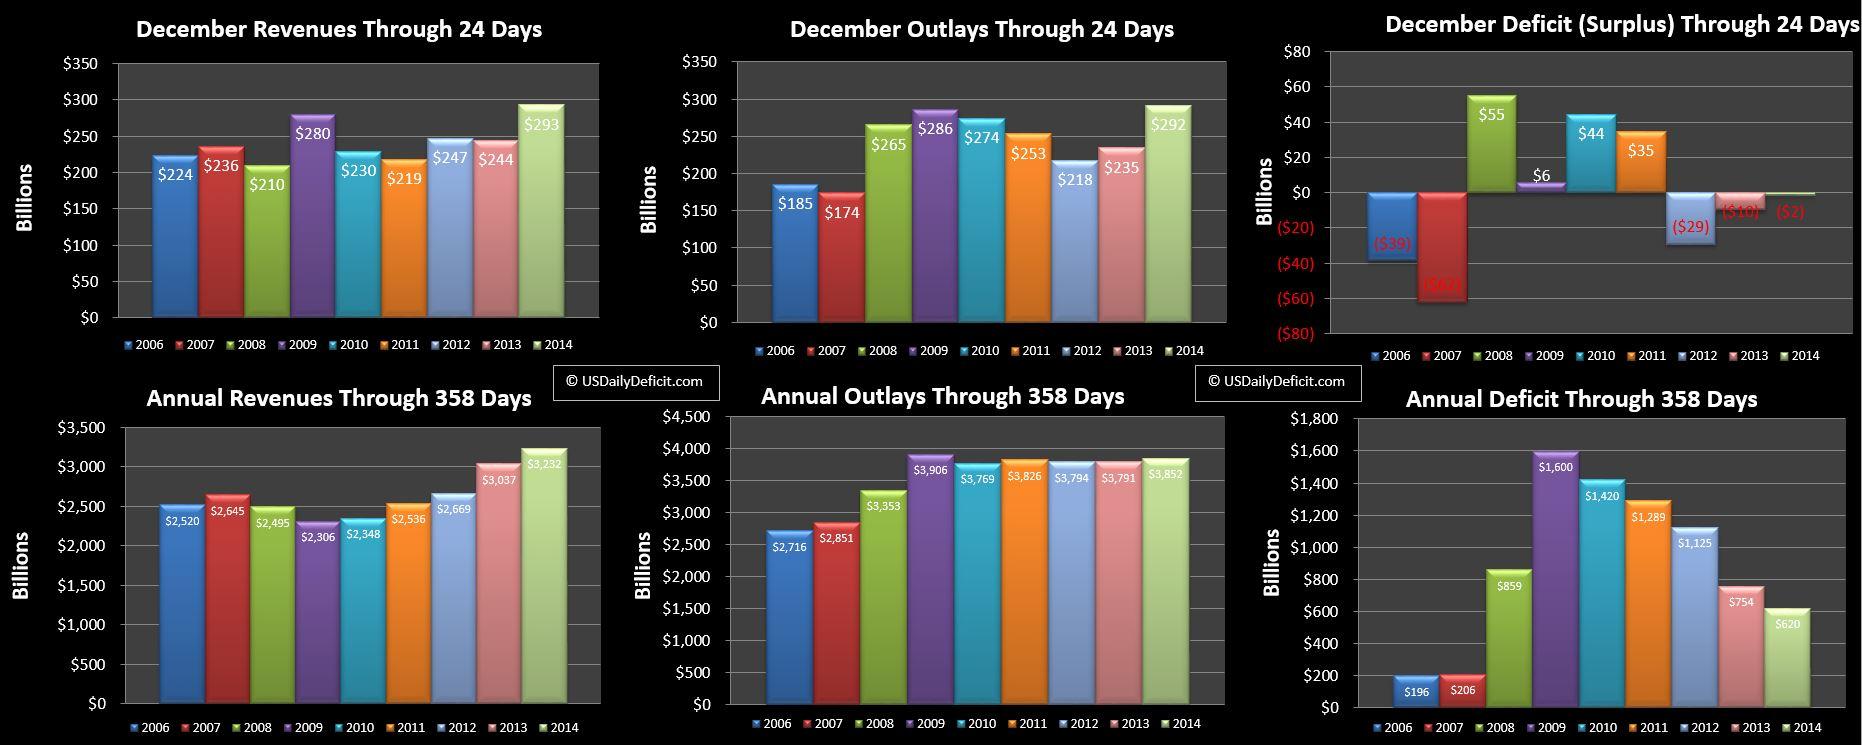 2014-12-24 USDD